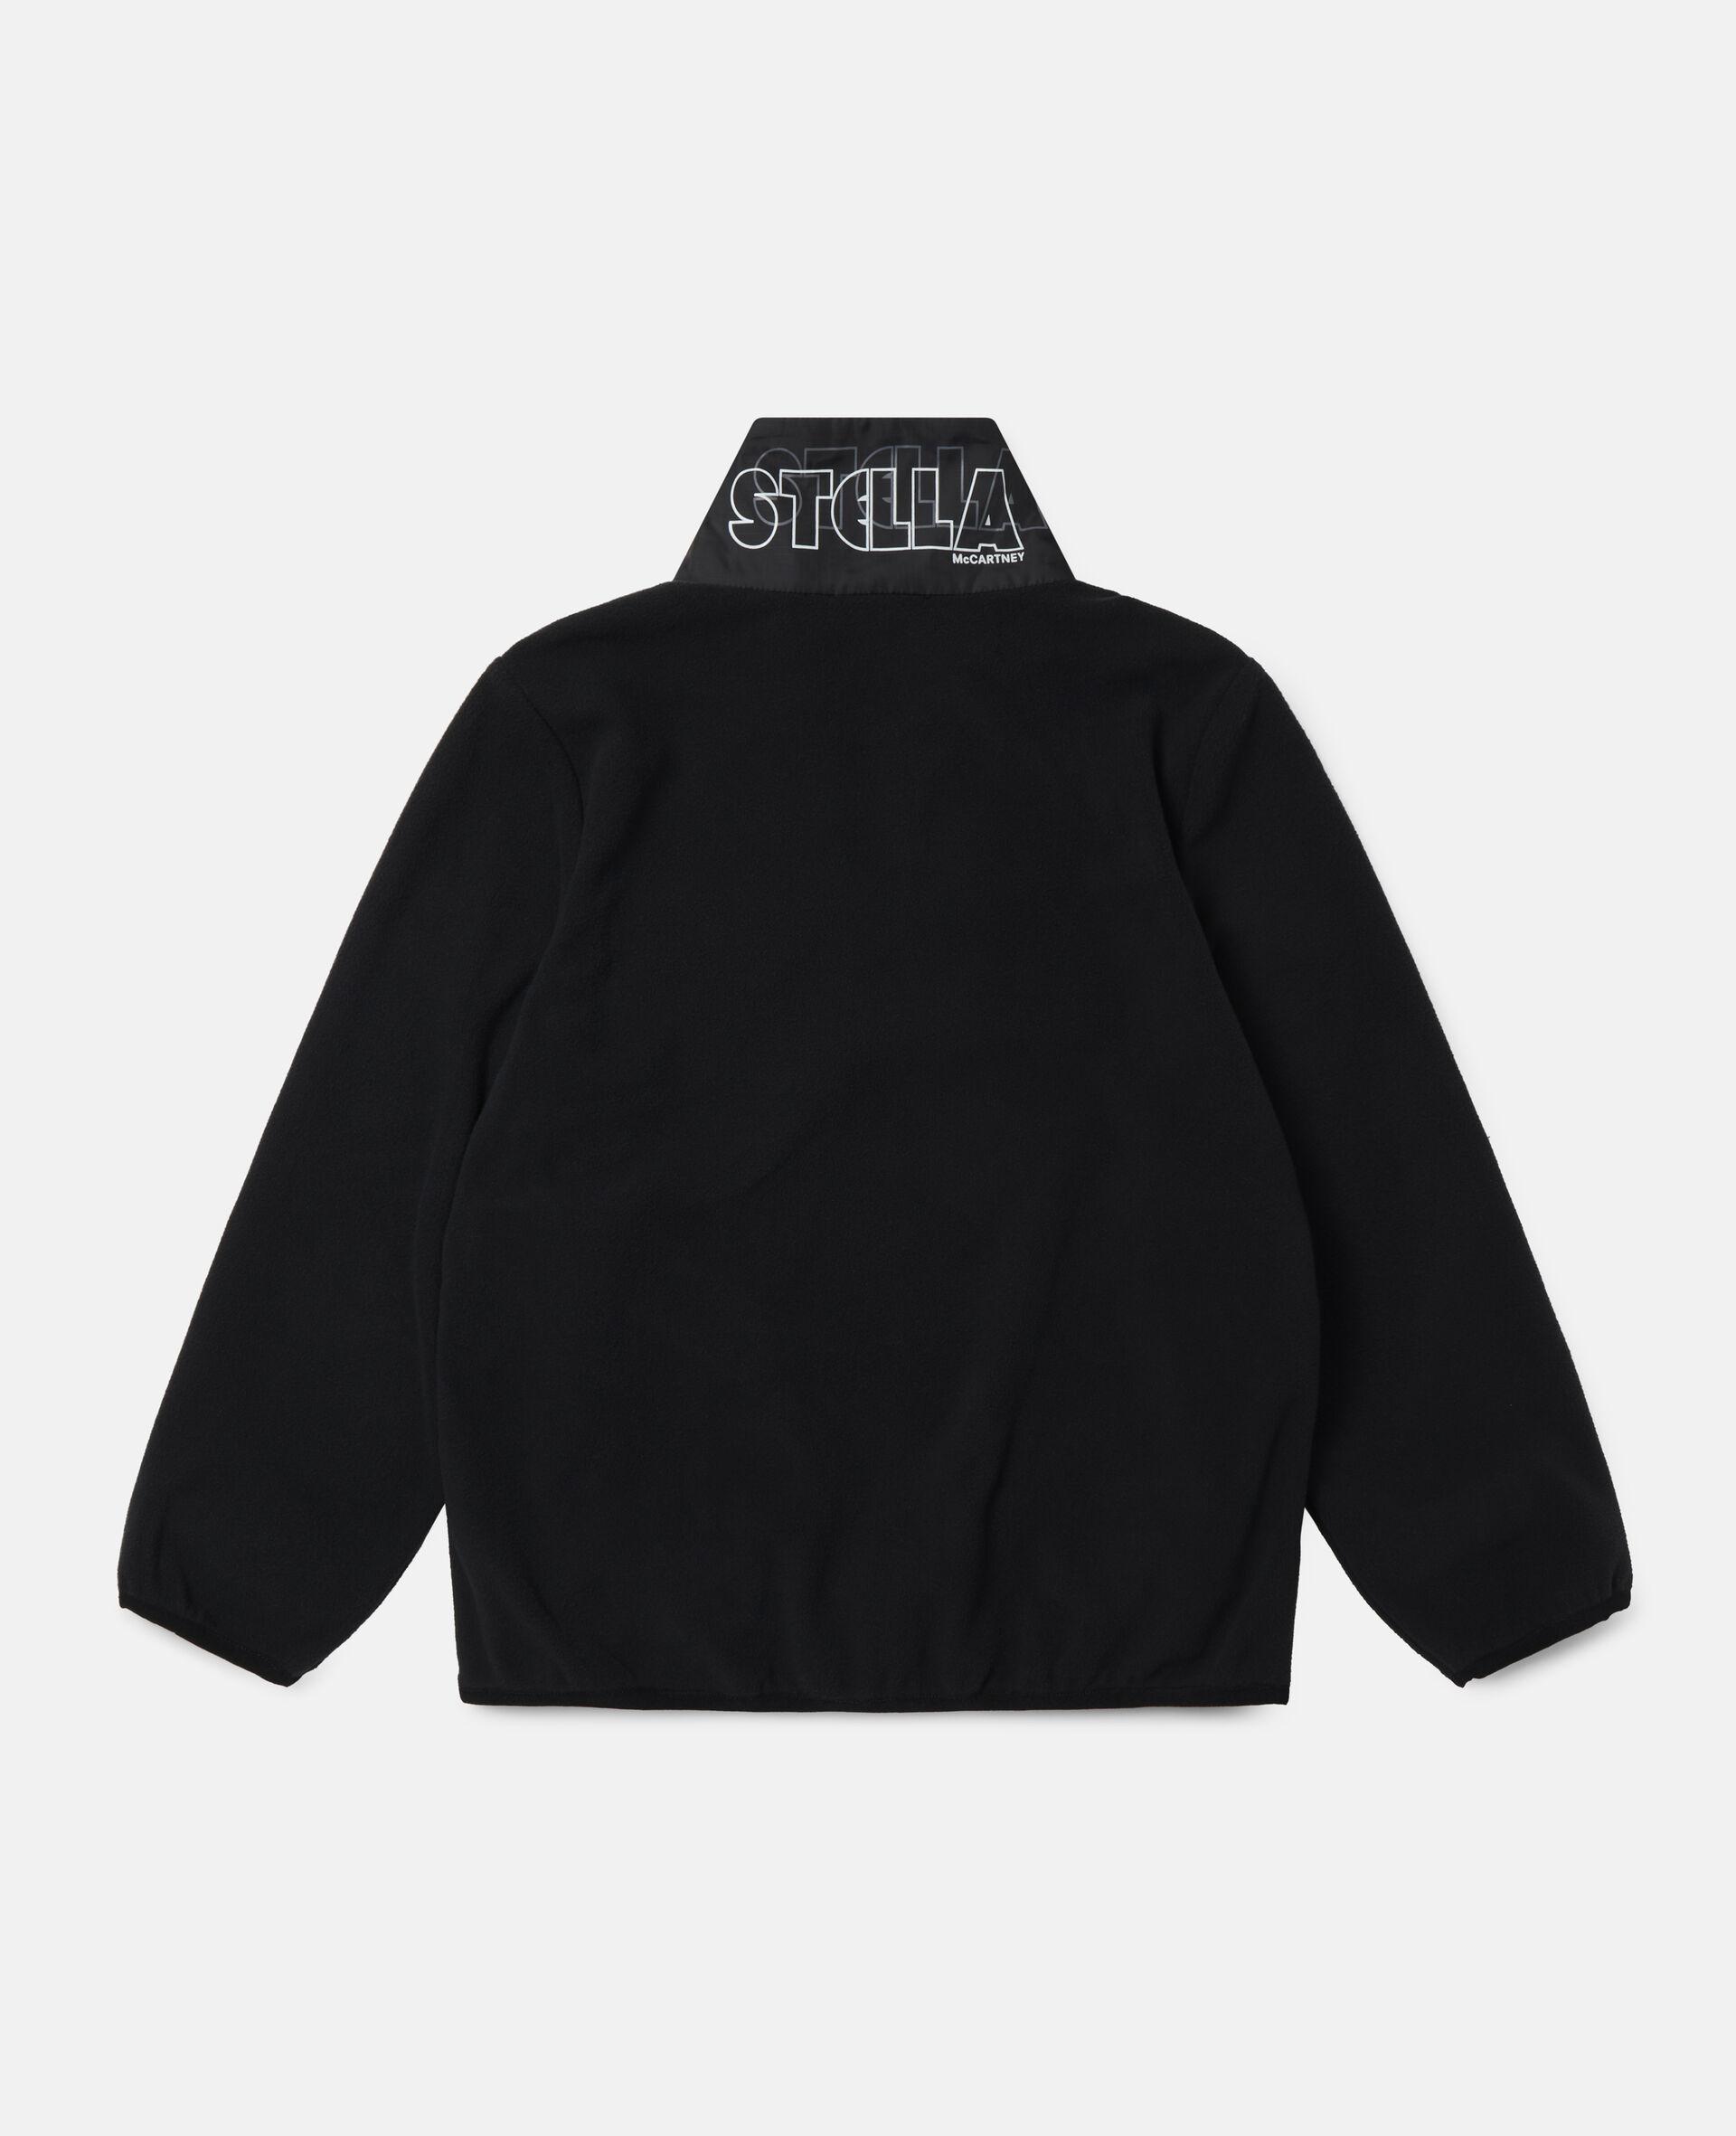 Stella Active Polar Sweatshirt-Black-large image number 3